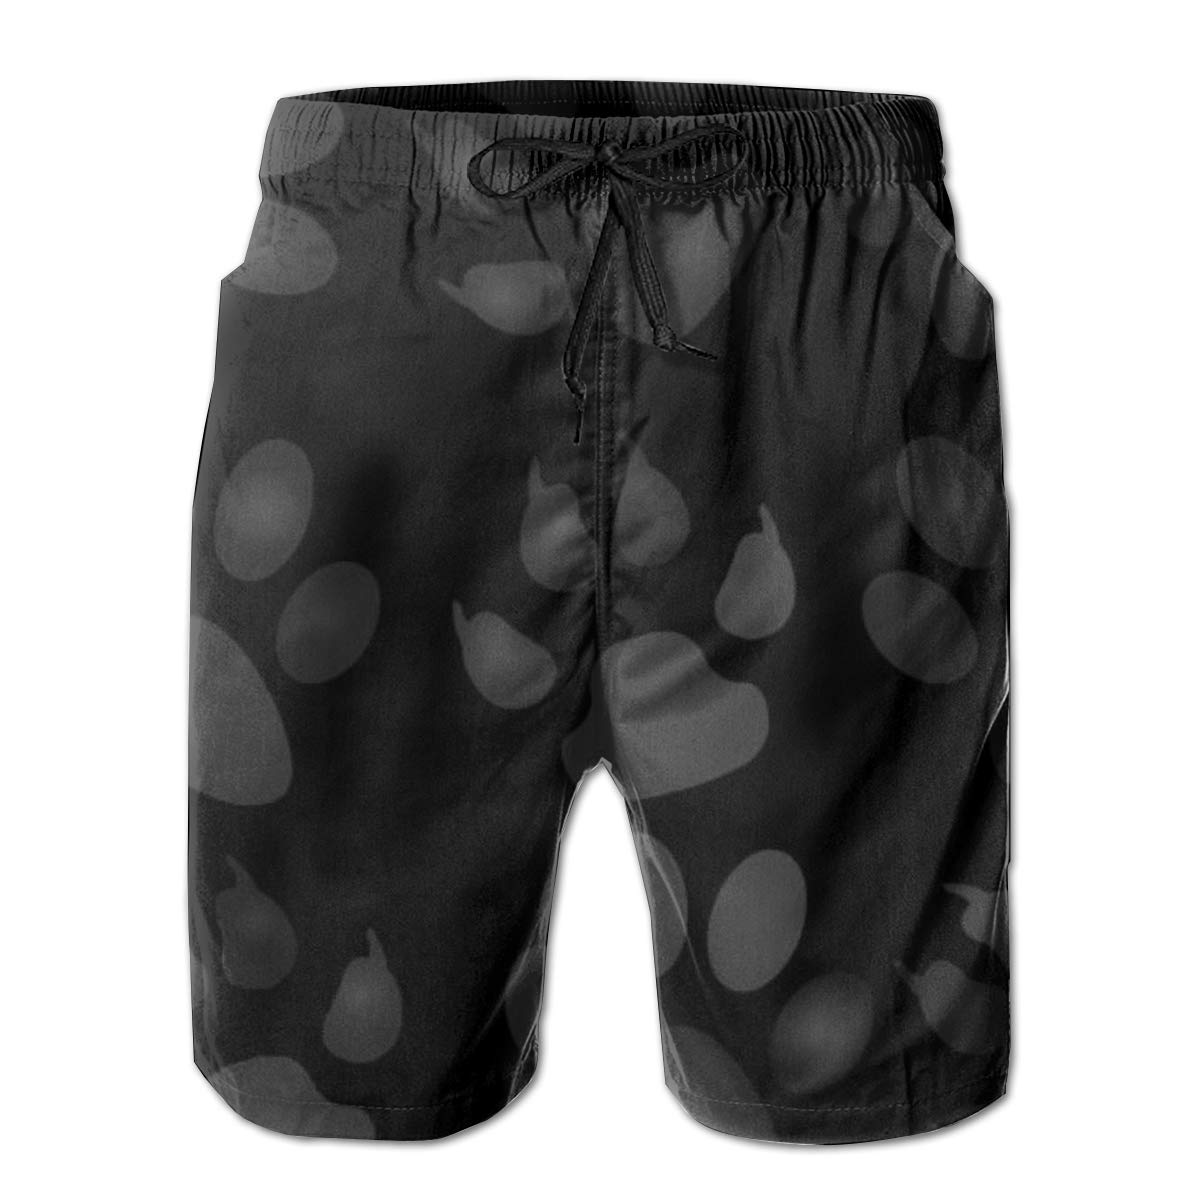 Black Dog Paws Summer Holiday Mesh Lining Swimwear Board Shorts with Pockets Mens Beach Shorts Quick Dry